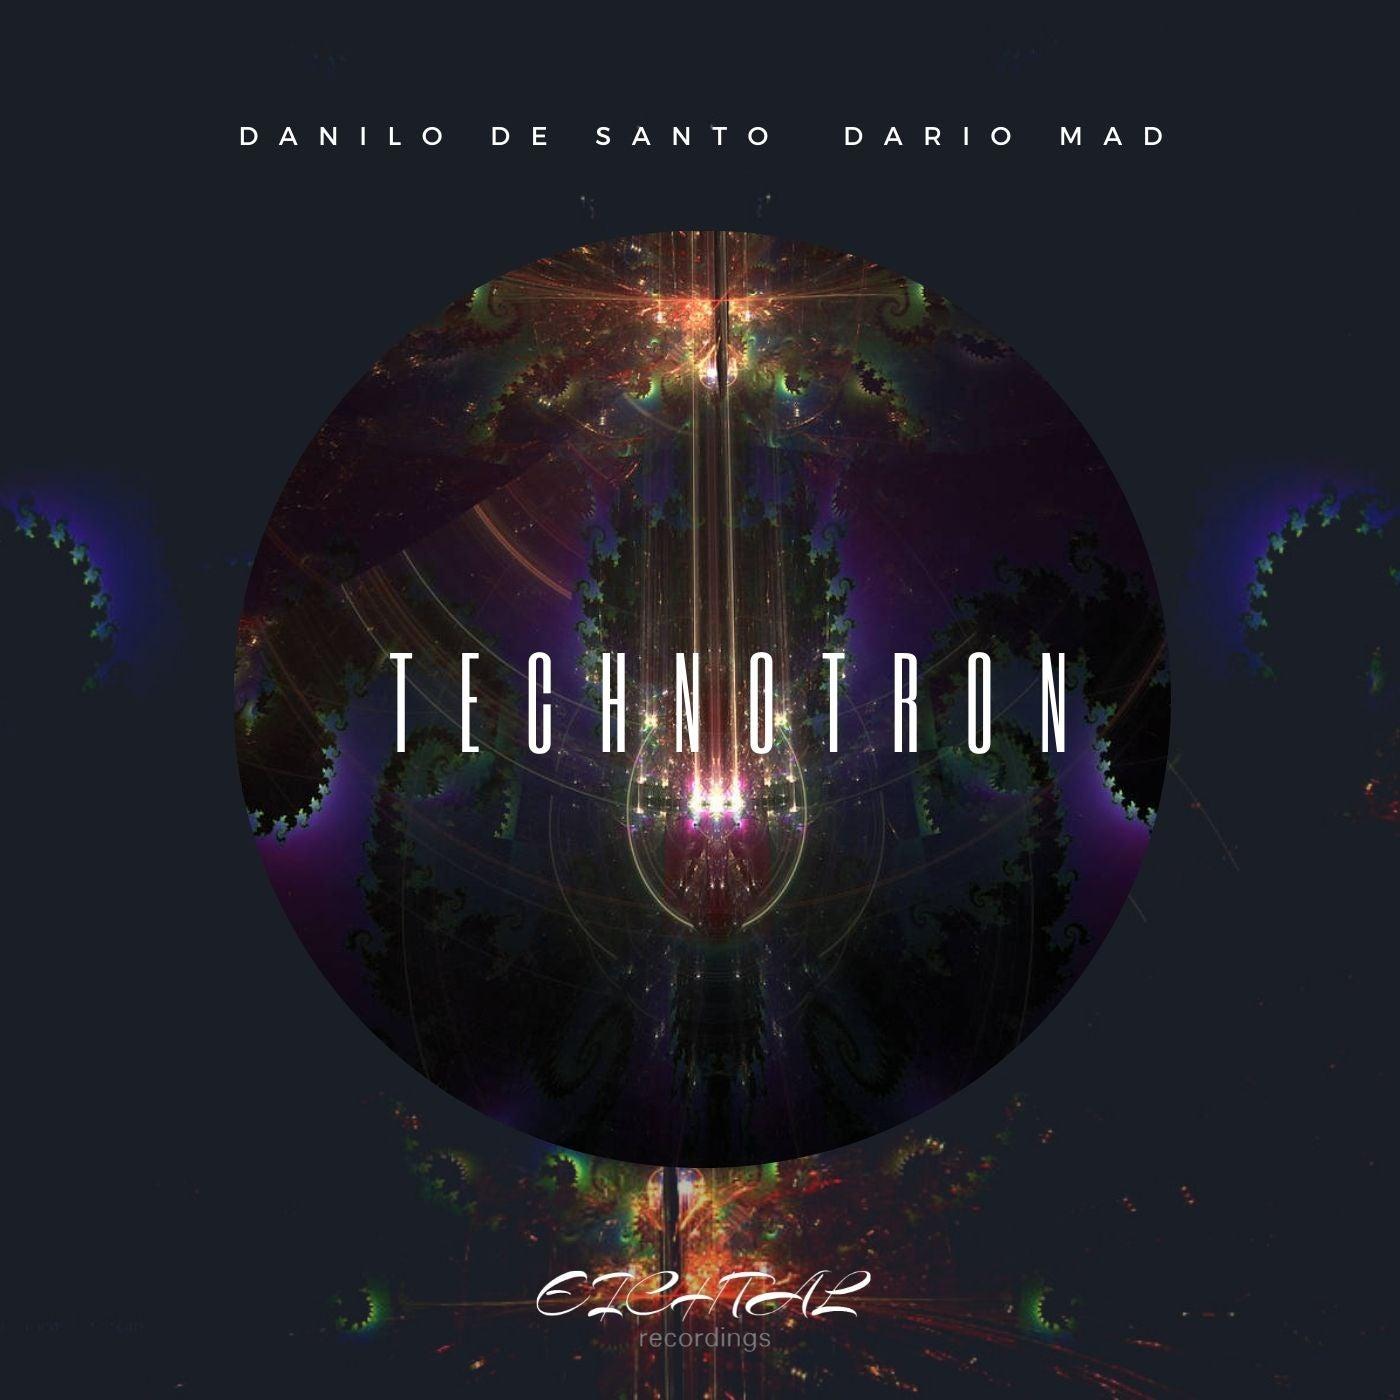 Technotron (Stanny Abram Remix)